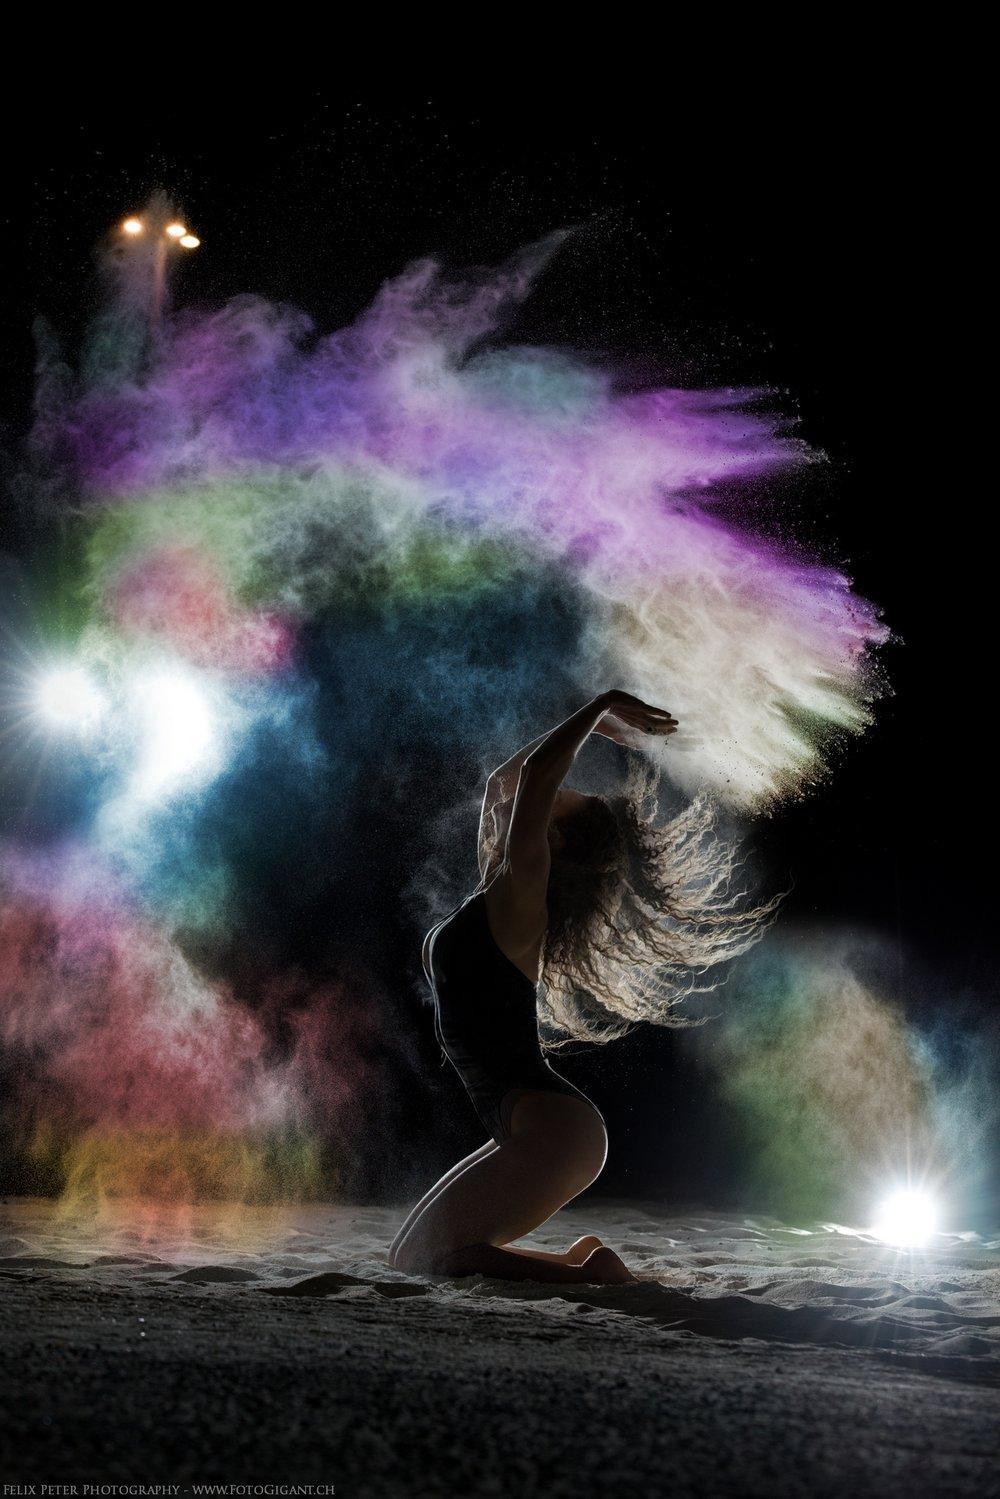 Felix-Peter-Yoga-Pilates-Dance-Fotografie_Bern_082.jpg